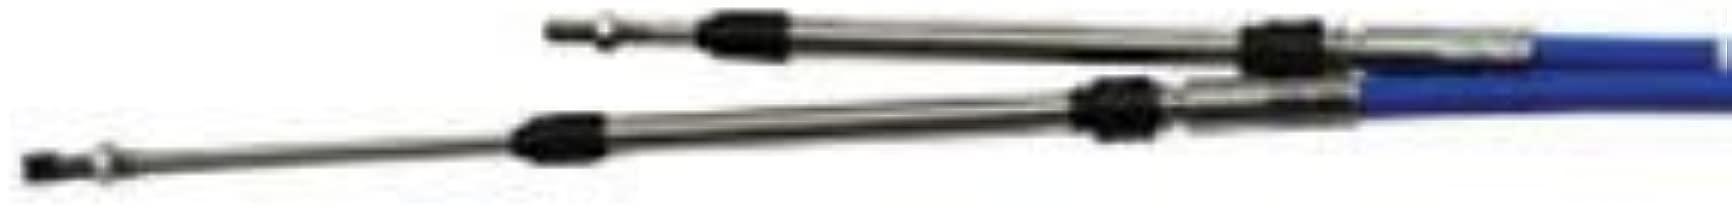 Kawasaki Steering Cable 750 SX/Sxi/Sxi Pro 59406-3726 1992 1993 1994 1995 1996 1997 1998 1999 2000 2001 2002